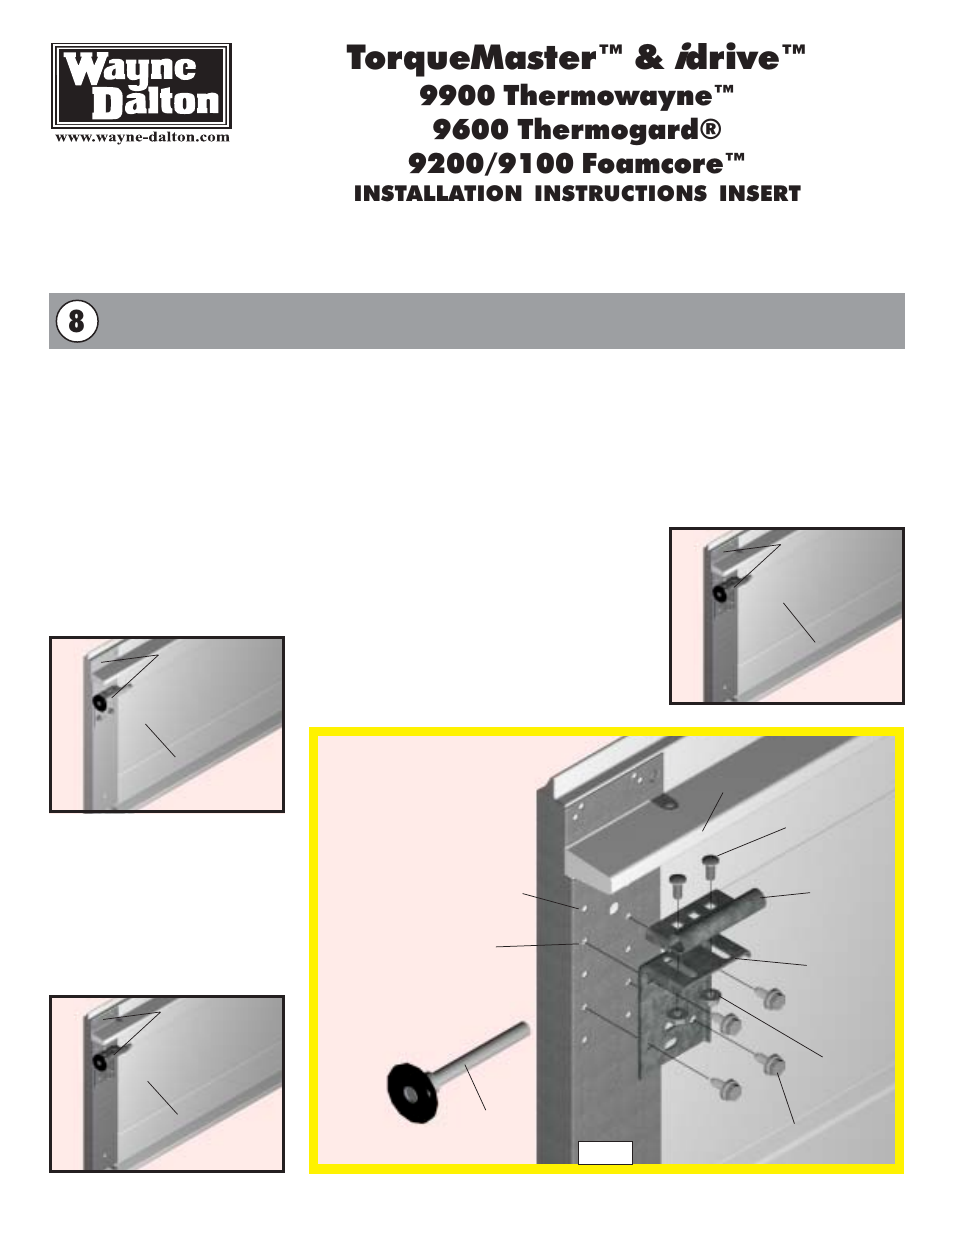 torquemaster i drive installation instructions insert wayne rh manualsdir com Wayne Dalton Replacement Parts Wayne Dalton Garage Door Openers